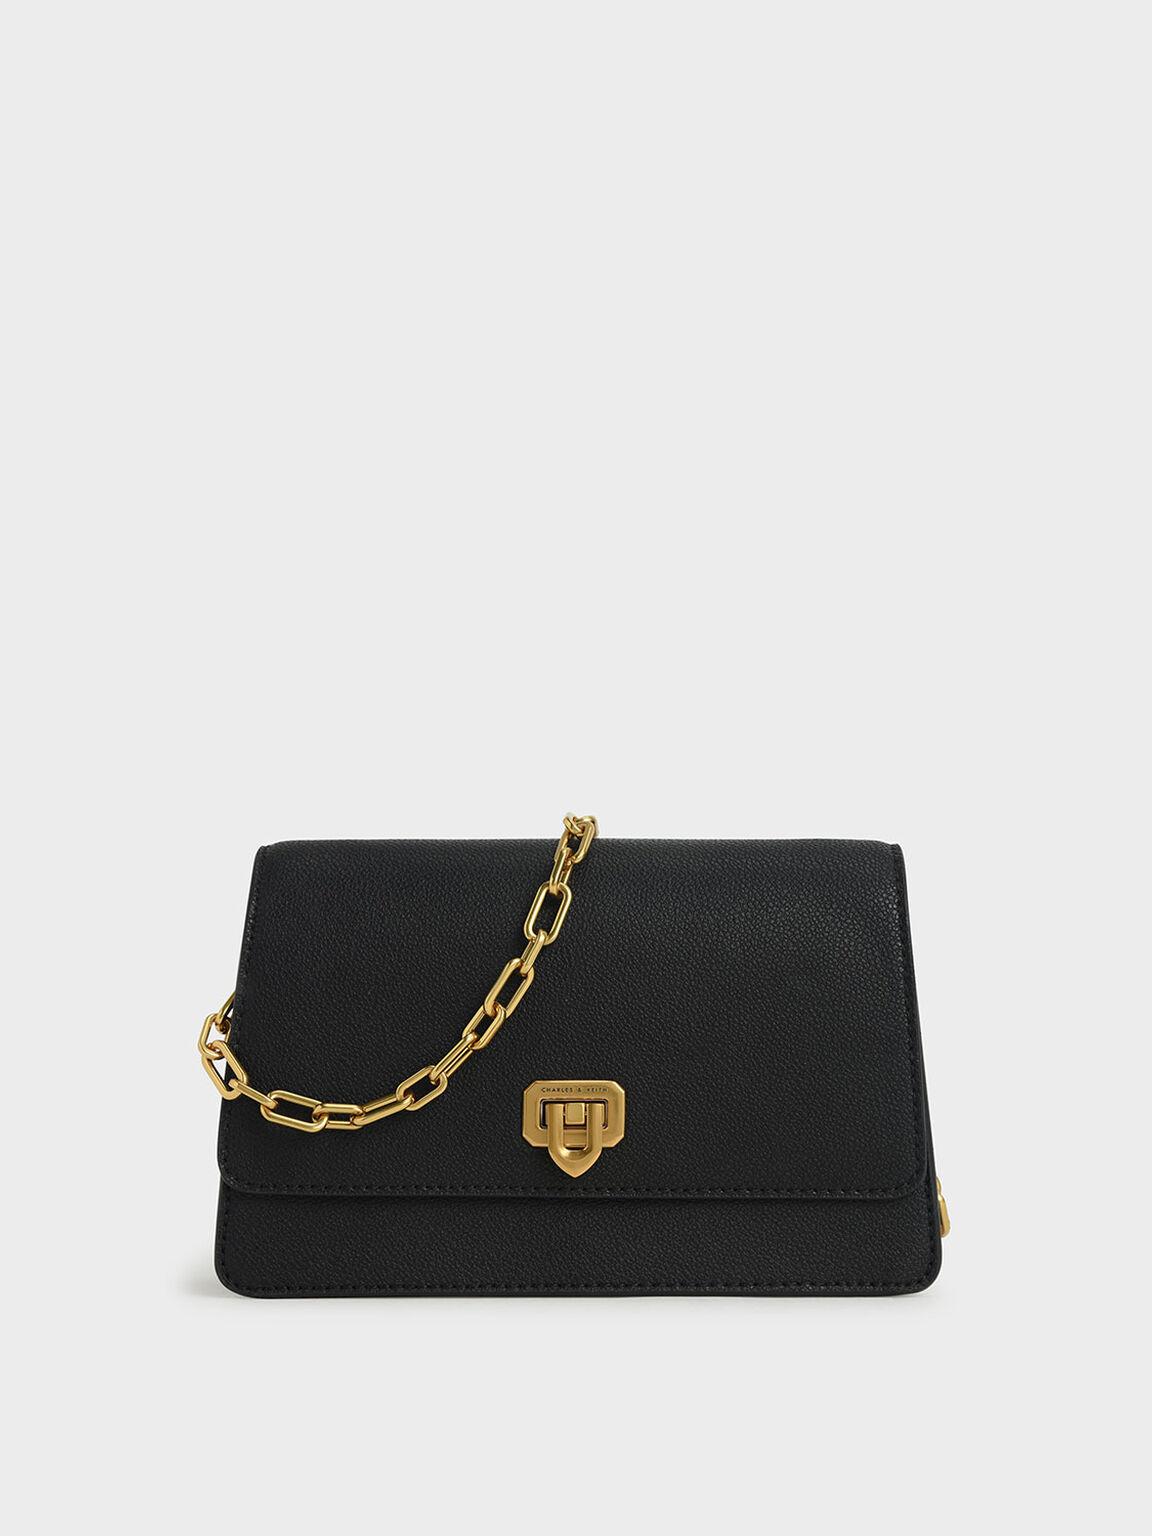 Double Chain Link Push-Lock Bag, Black, hi-res